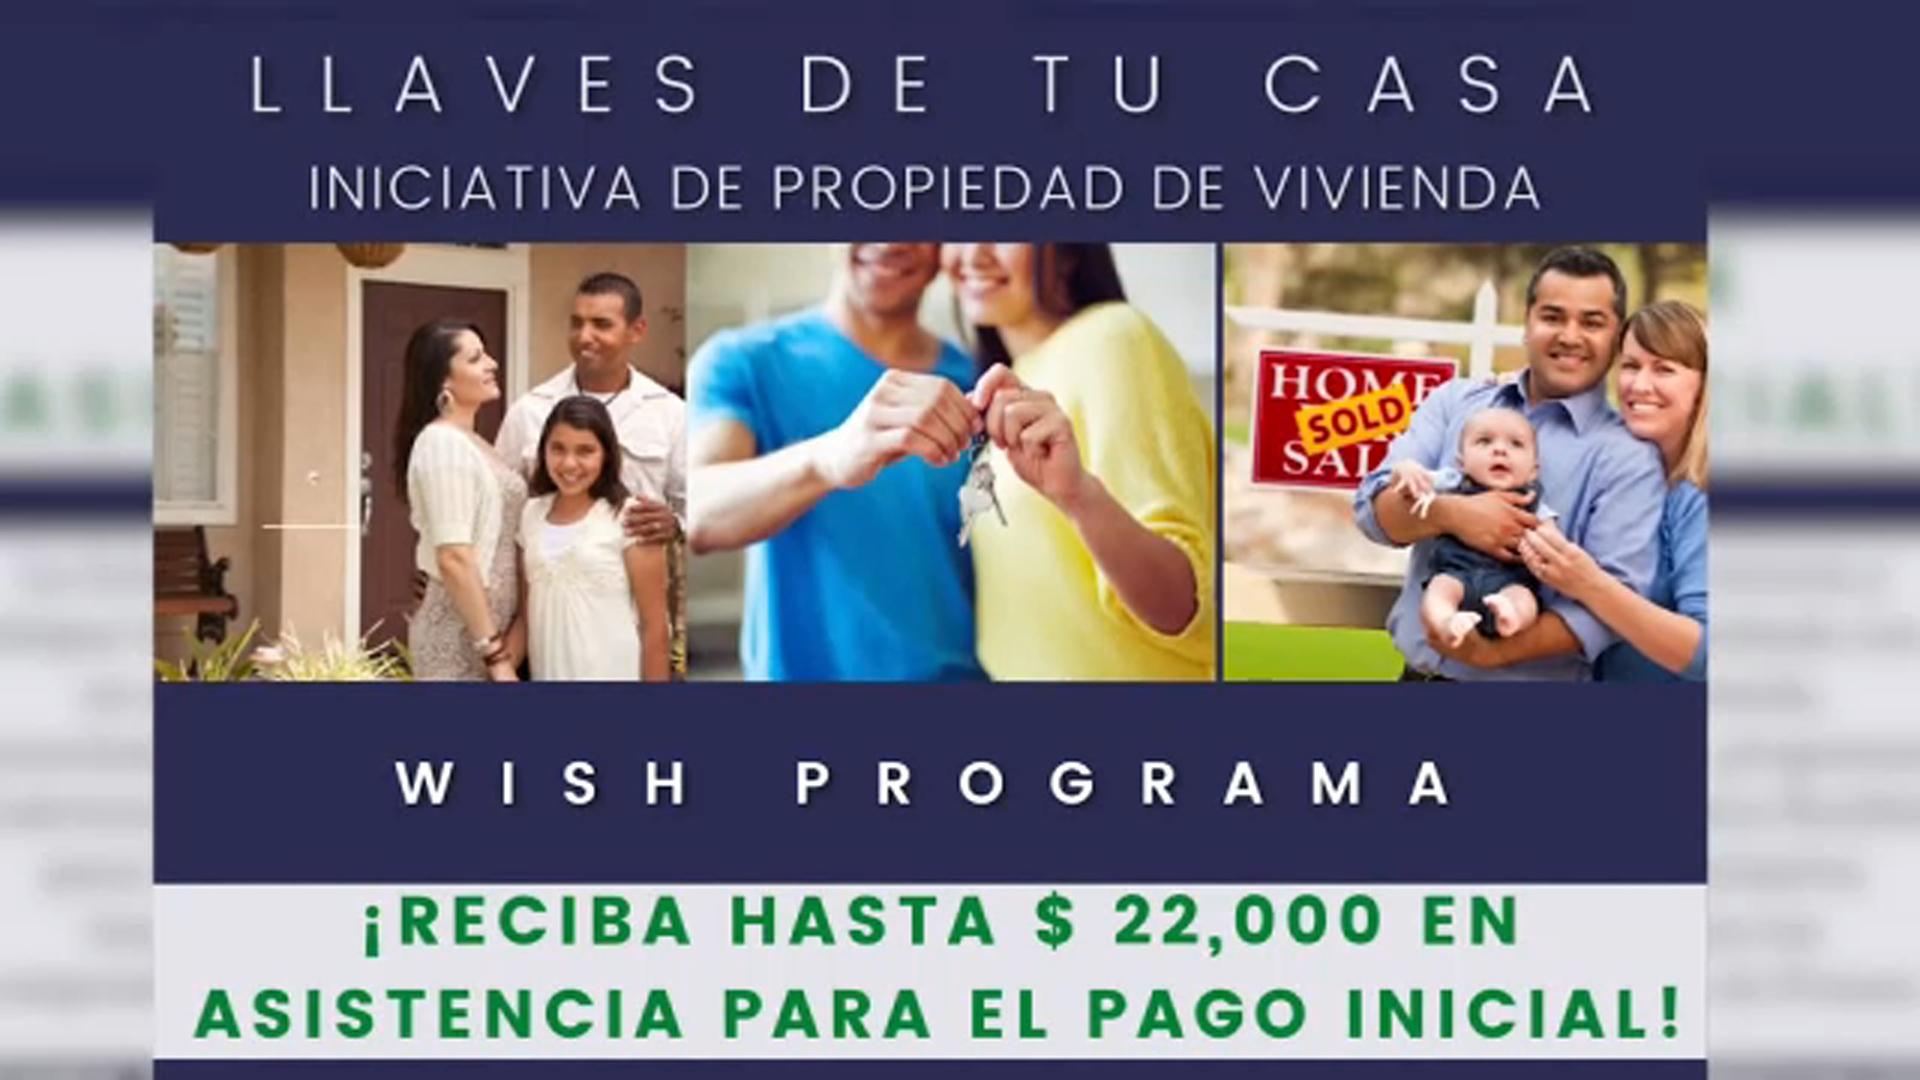 abc30.com - Elisa Navarro - New program set to help Latinos in competitive housing market